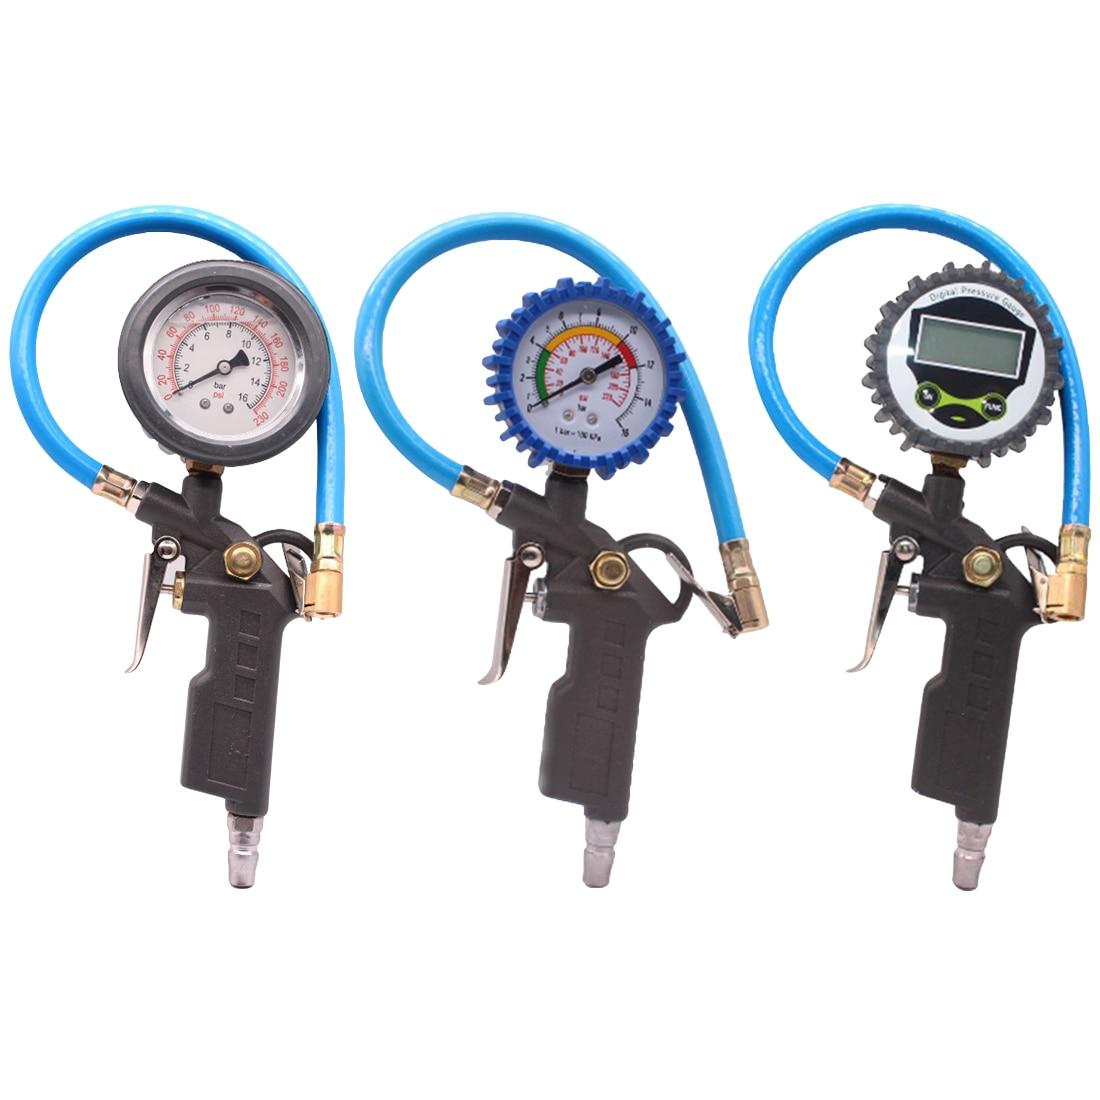 0-220PSI 0-16bar Digital Tyre Pressure Gauge Tyre Tire Air Pressure Inflator Gauge Meter Tester Manometer lematec pro dial meter vehicle tester tire pressure gauge with flexible hose ce 220psi tire diaphragm gauge